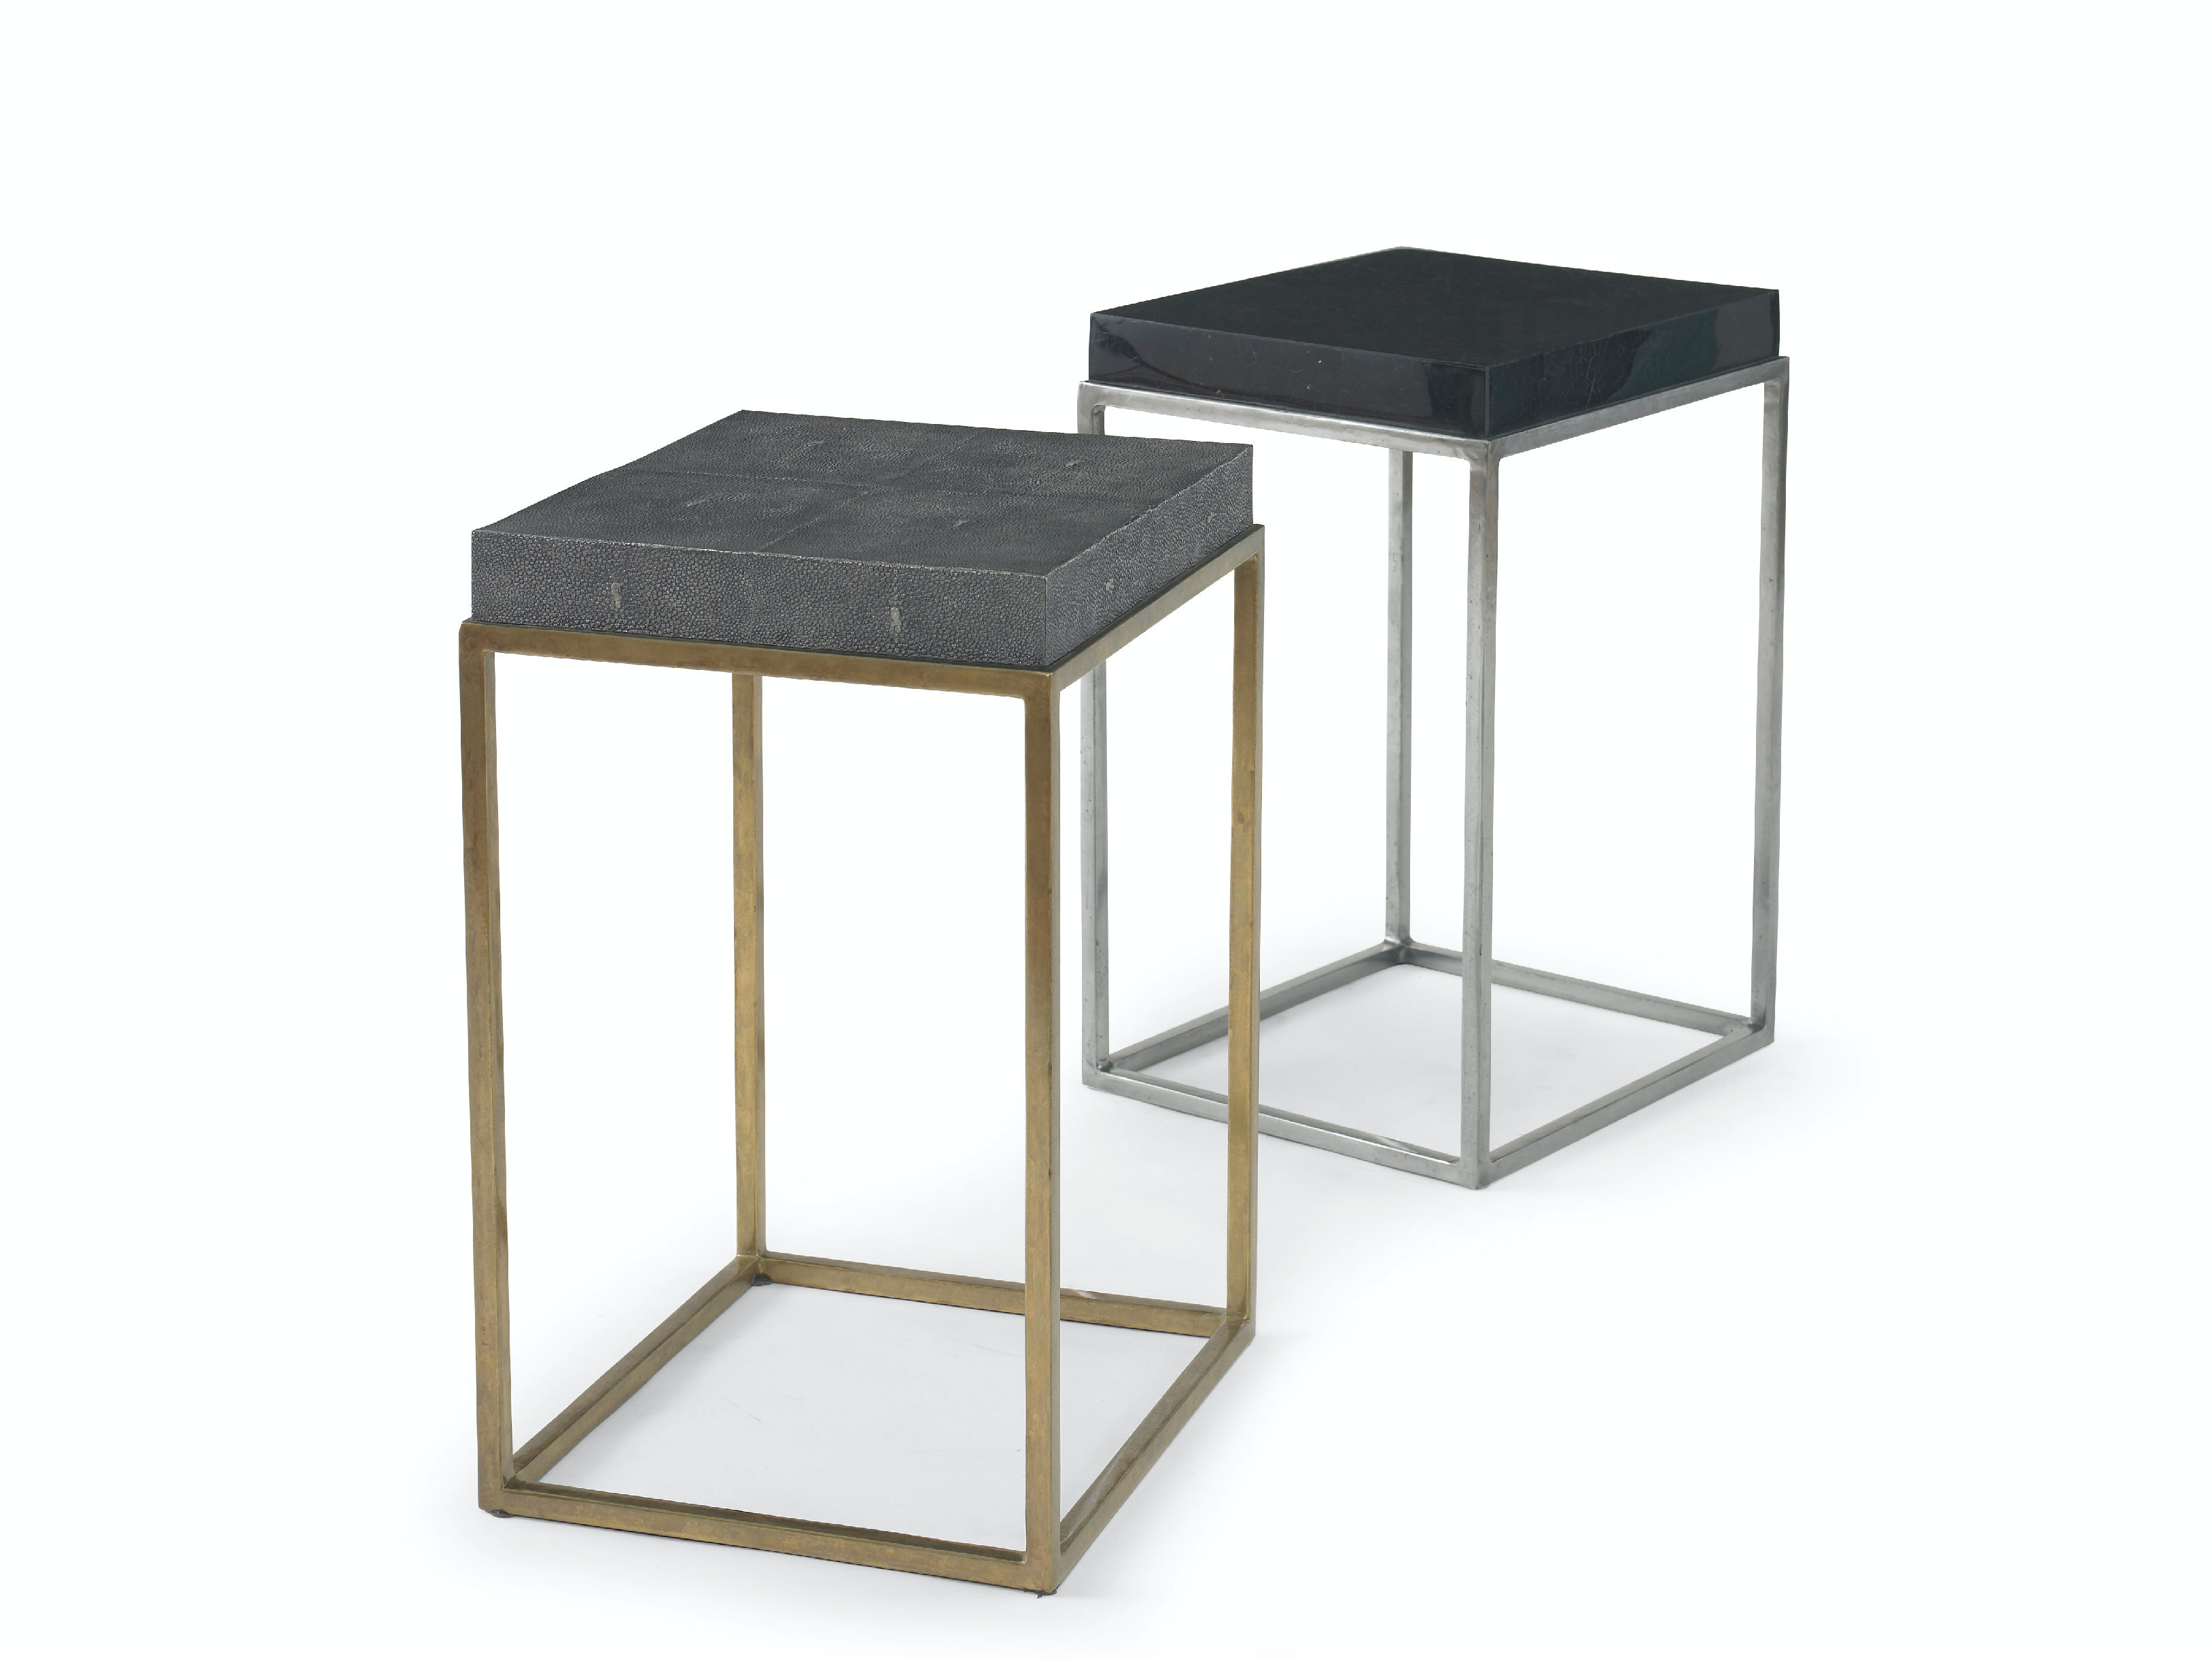 Kravet Brass/Faux Shagreen Side Table OT802B/S